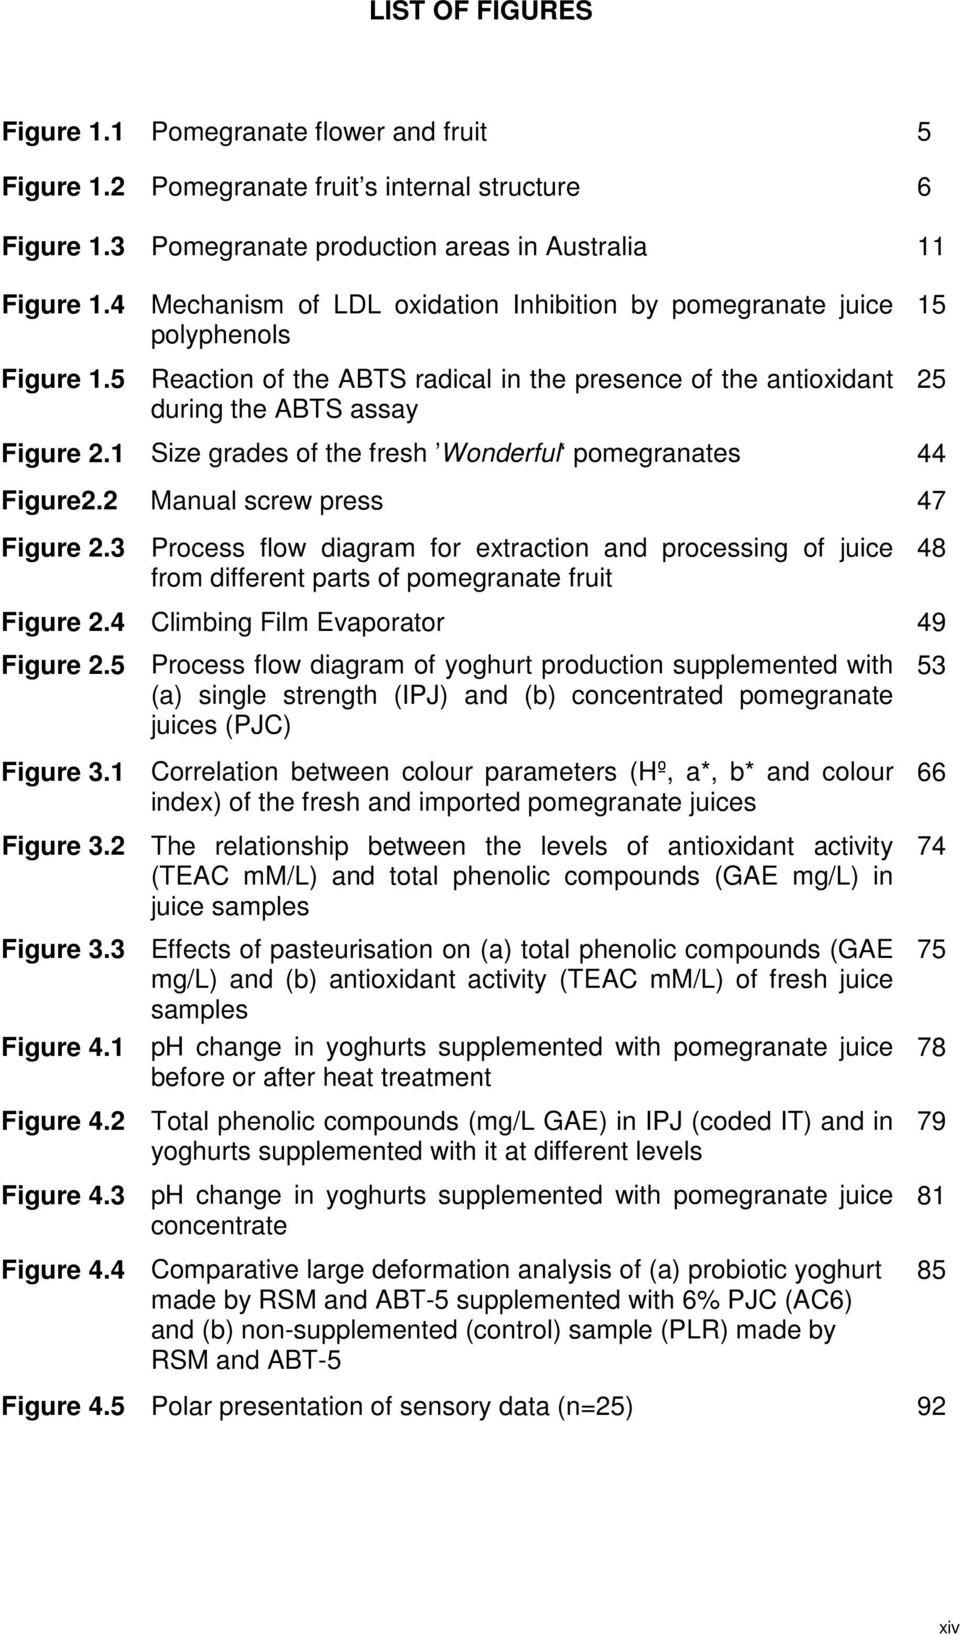 medium resolution of 1 size grades of the fresh wonderful pomegranates 44 figure2 2 manual screw press 47